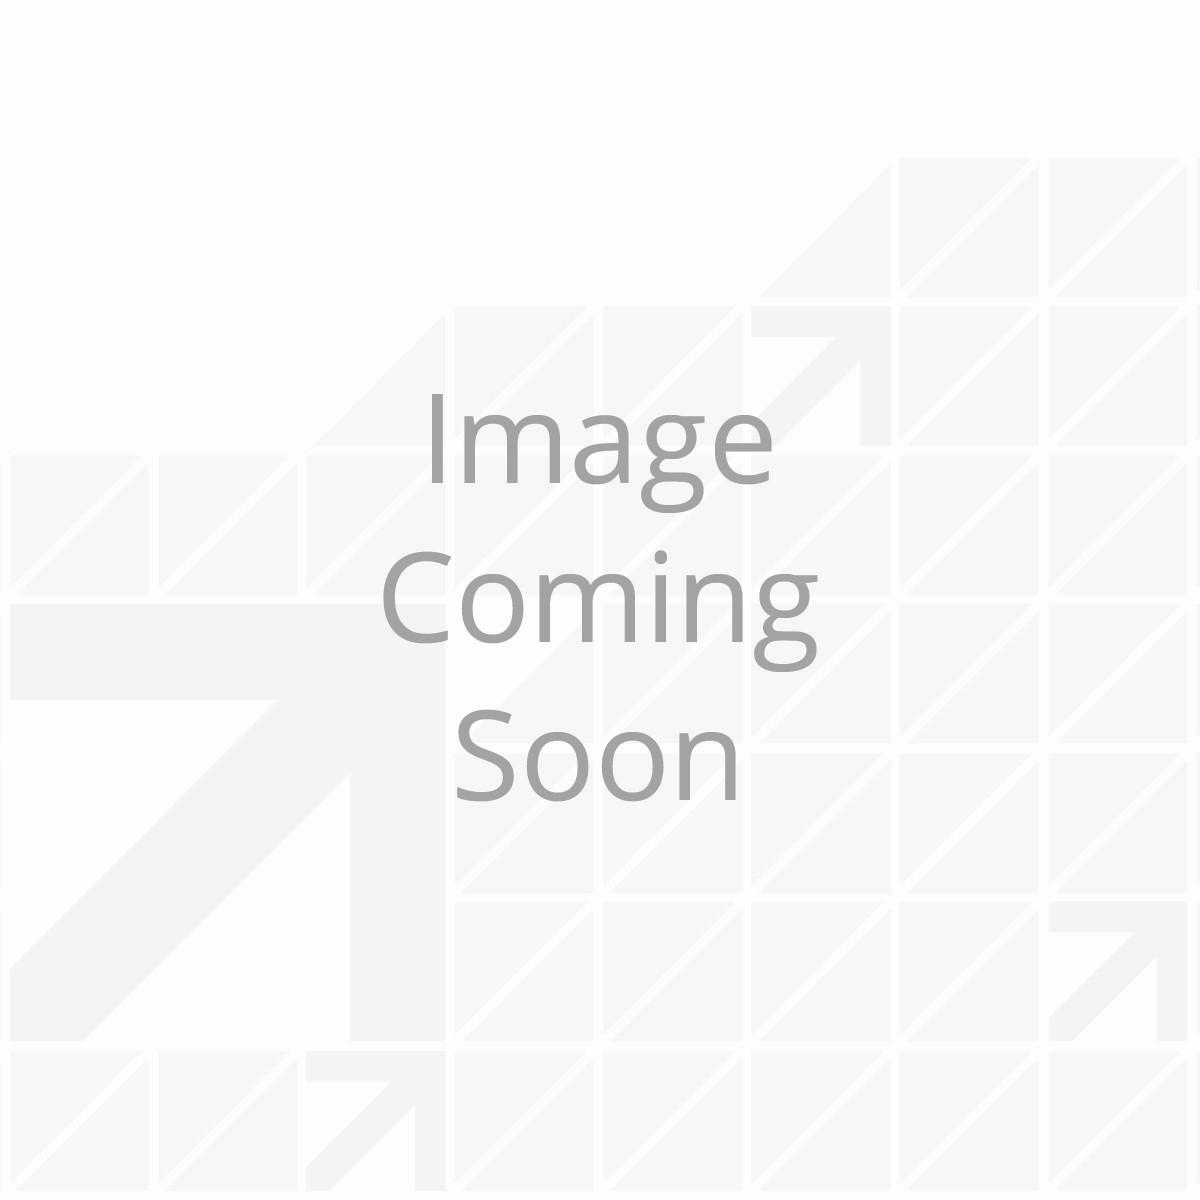 Puck System 5th Wheel Legs, Select Silverado, Sierra 2500, 3500 HD, 8' Bed, 25K